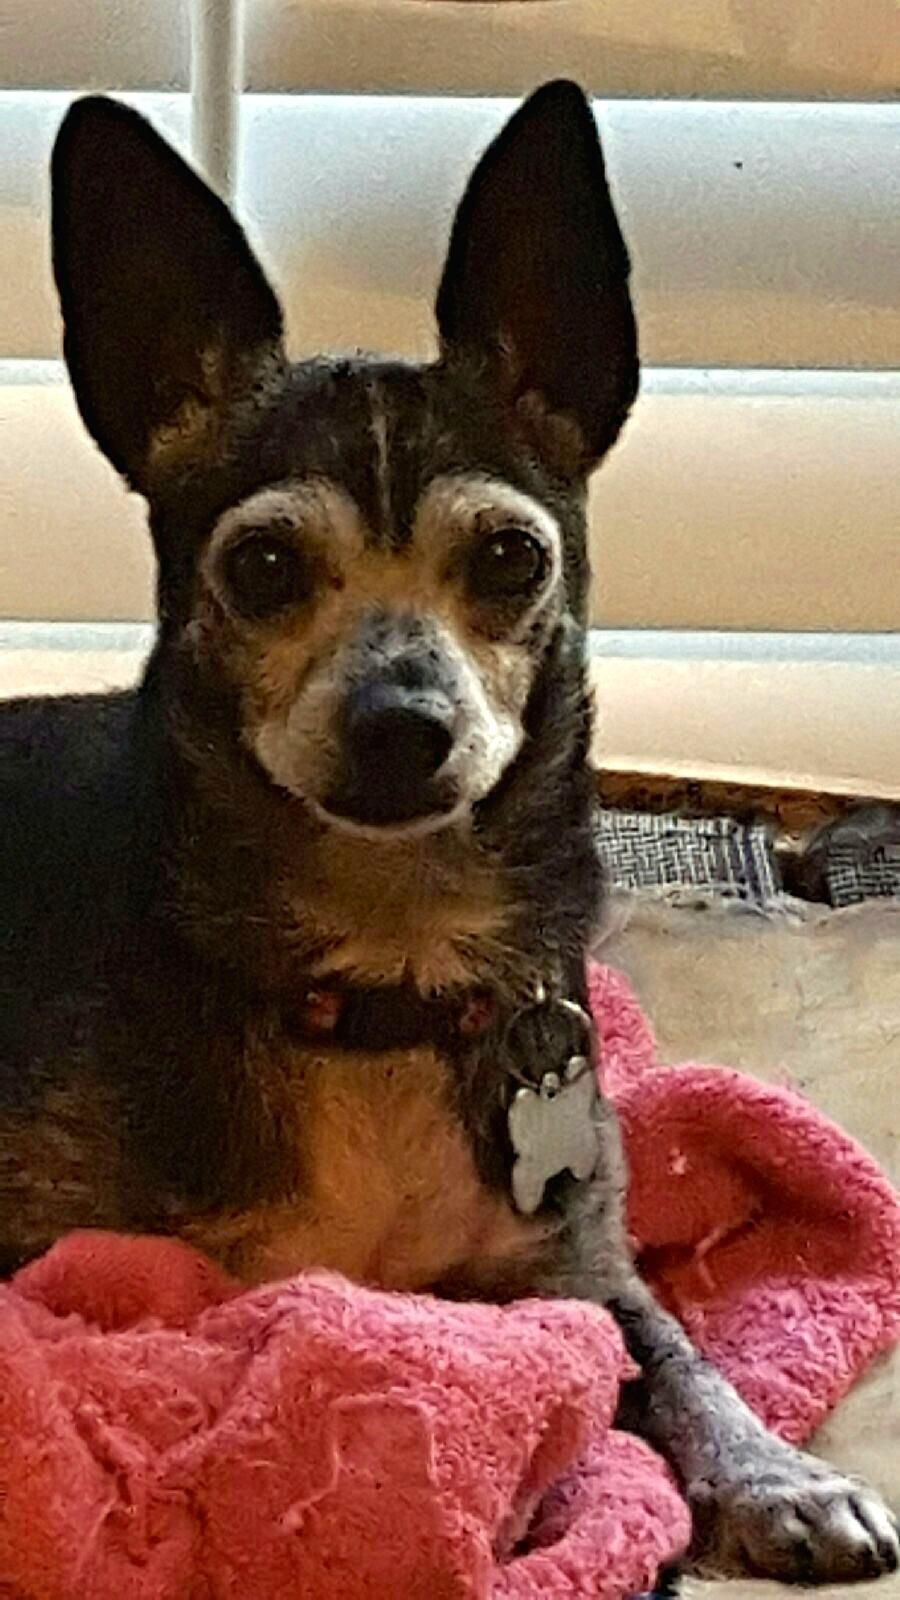 GayWeHo Dogs 4 U 🐶 on Dogs, Chihuahua, Pup